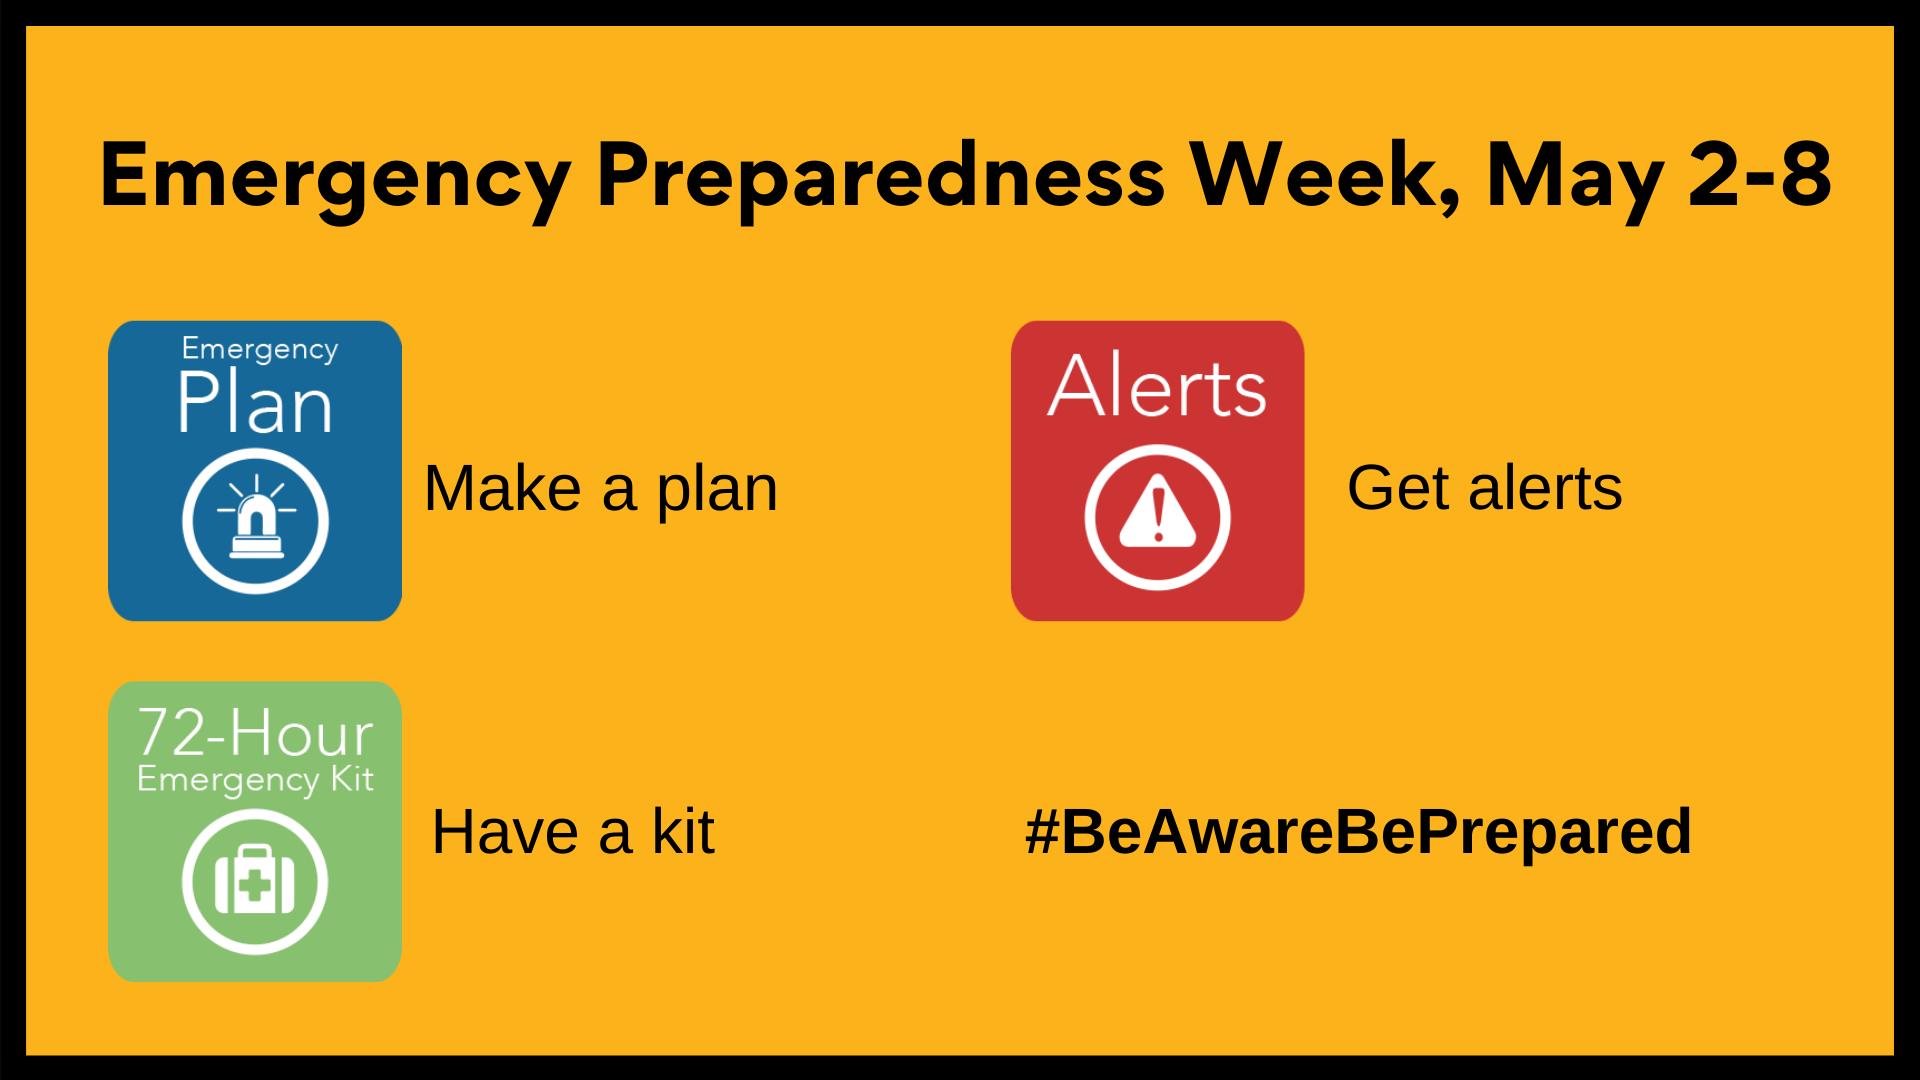 Emergency Preparedness Week is May 2-8. Make a plan. Have a kit. Get alerts. Be aware, be prepared.